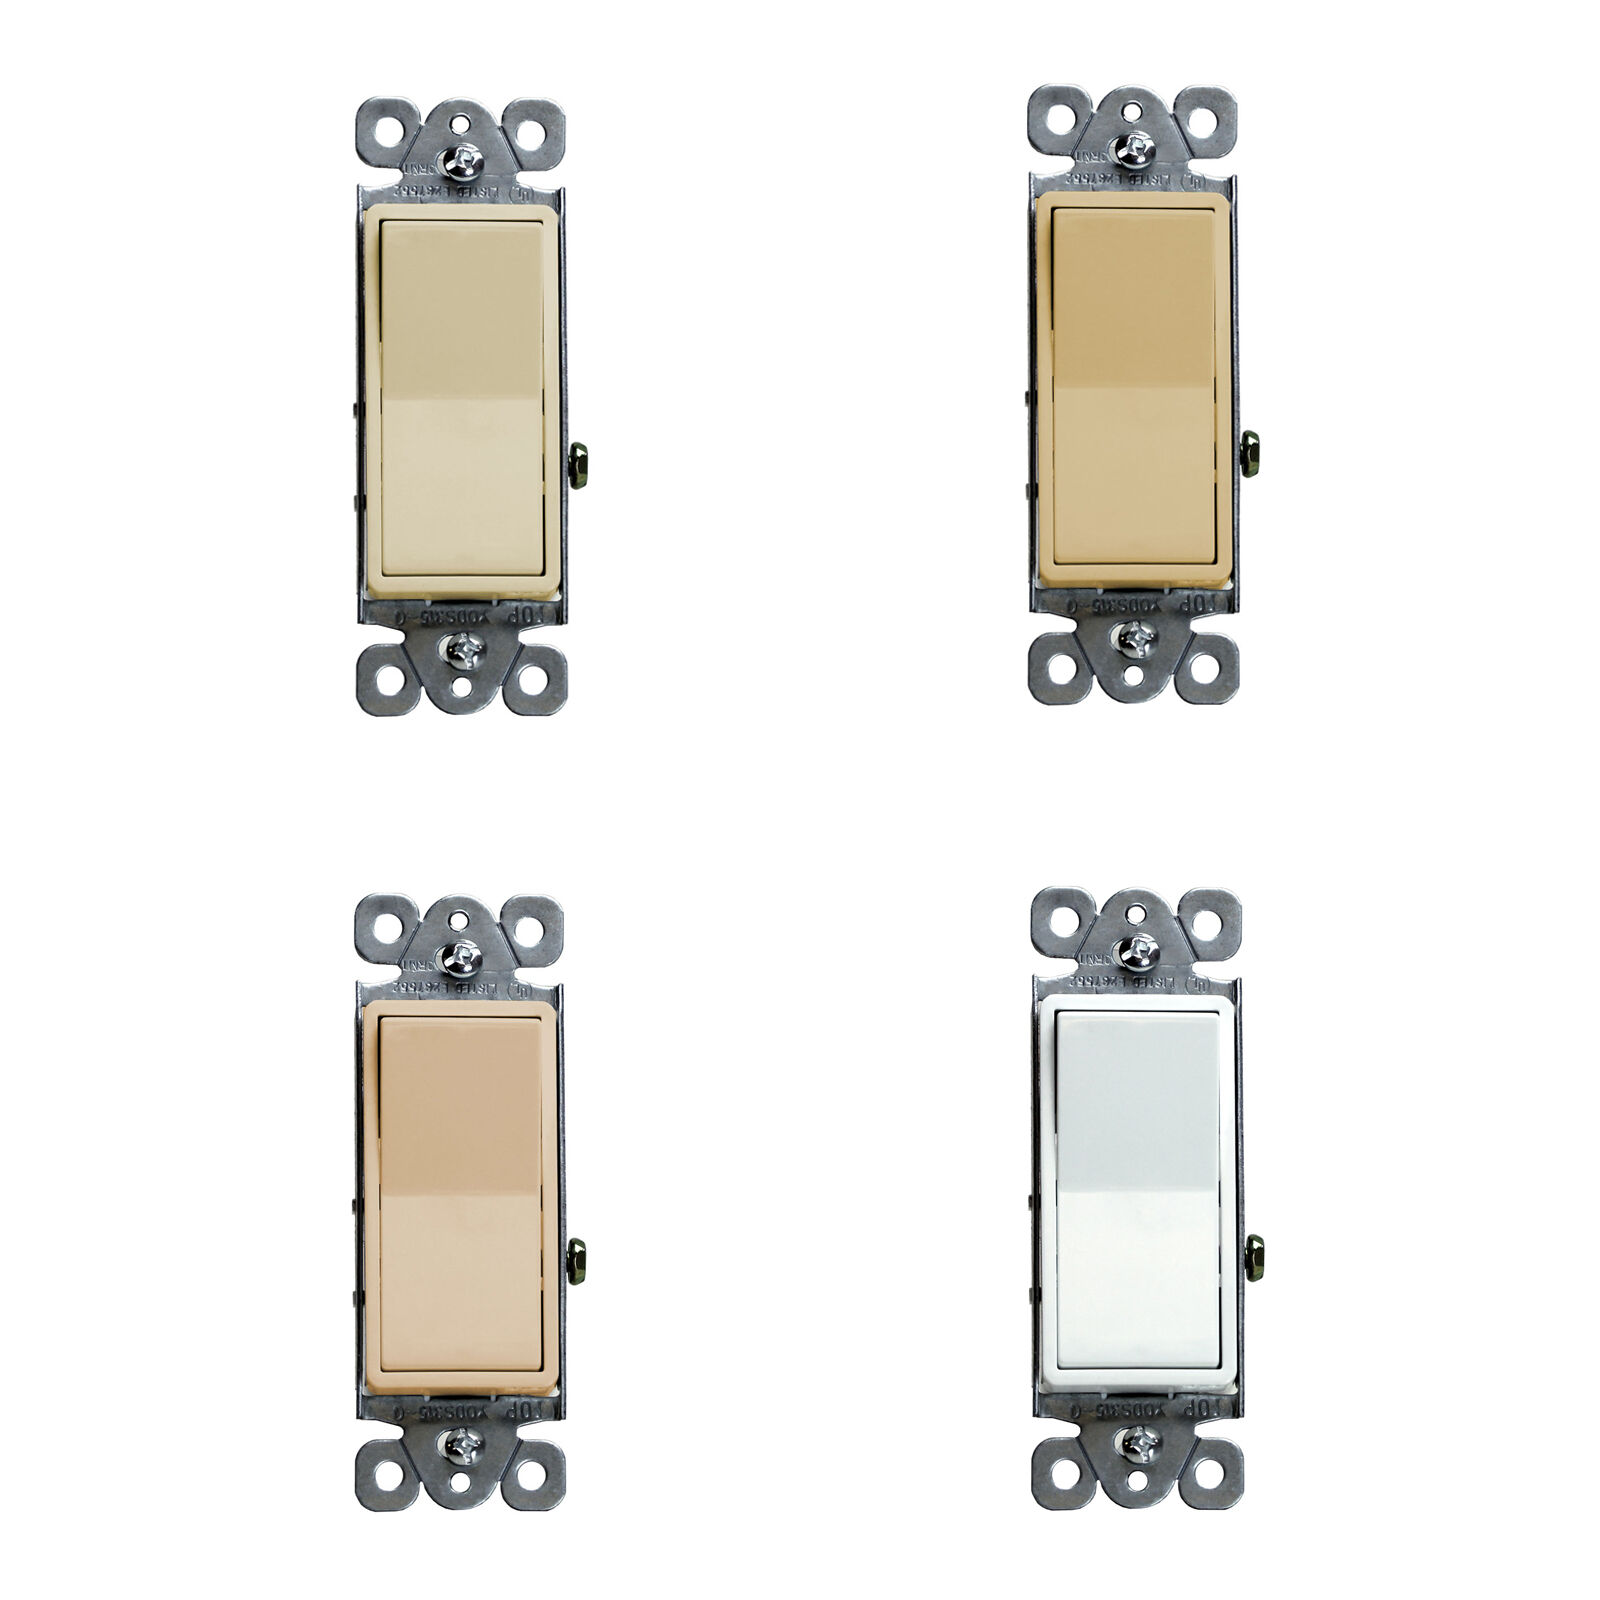 10PK Decorator 15A Switch 3 Way /SPST Lighted Illuminated Rocker ...